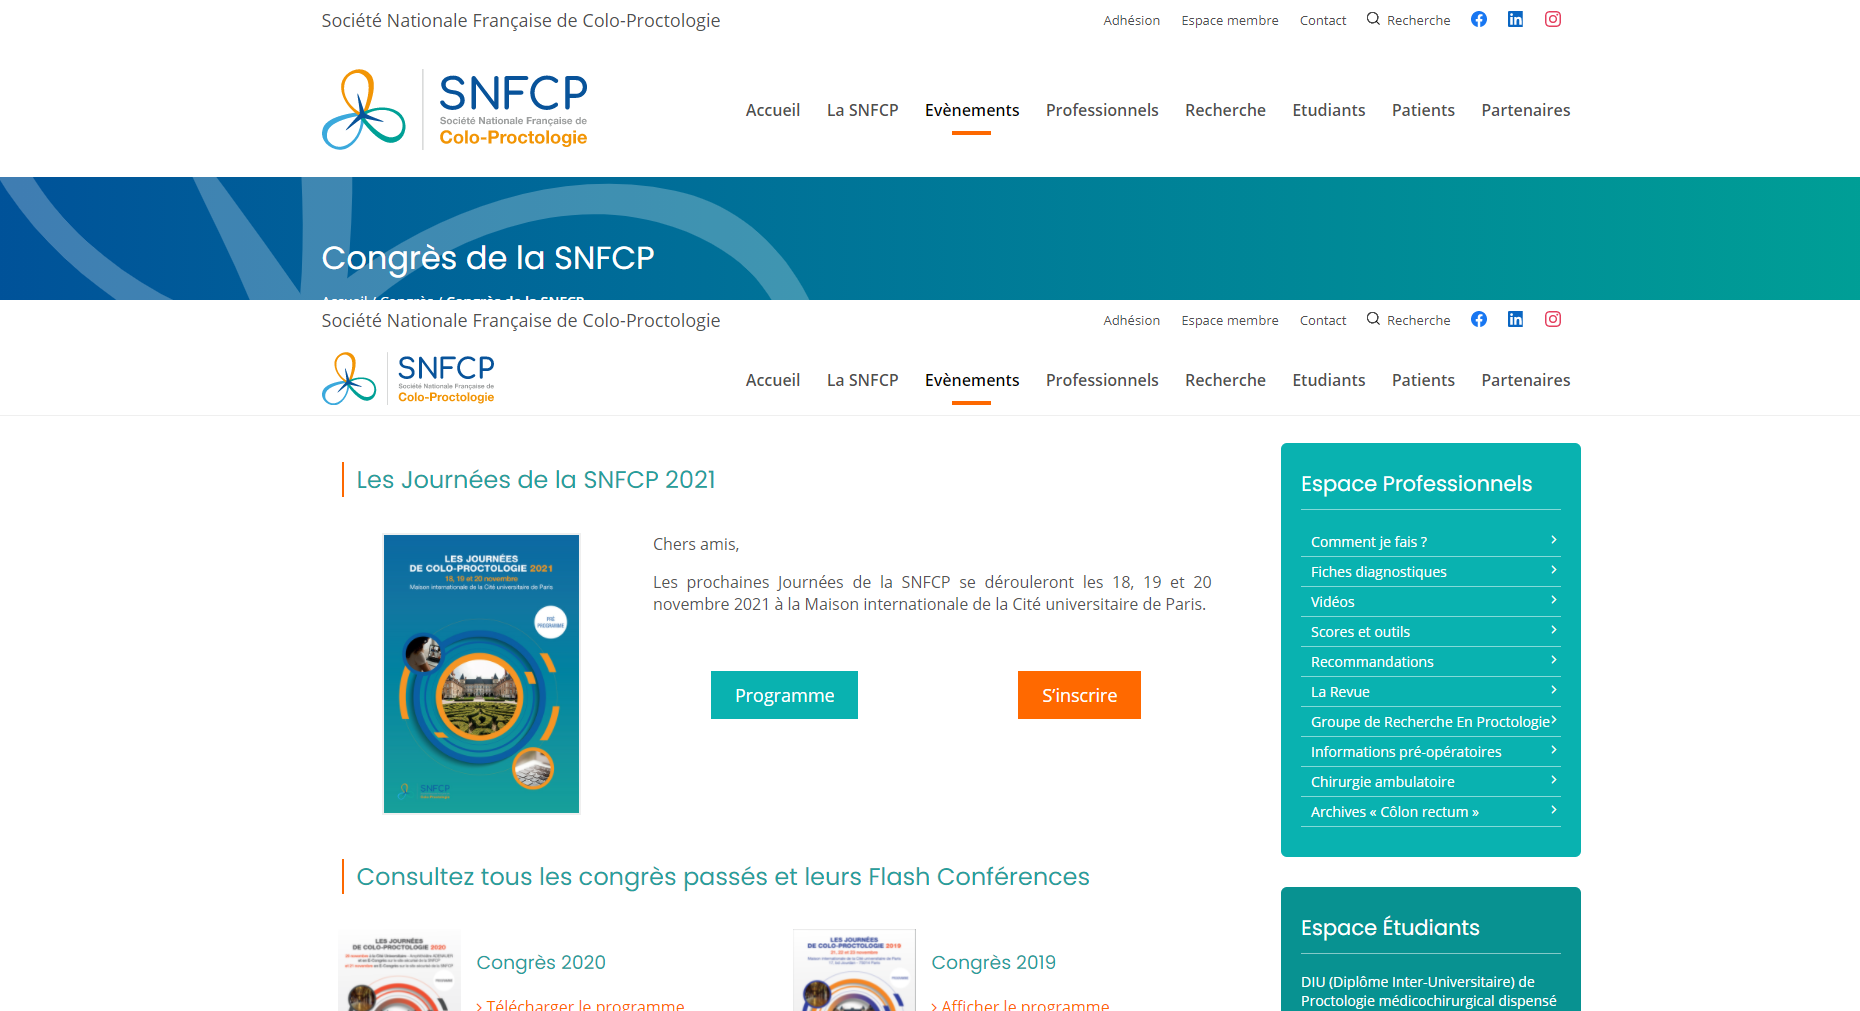 SNFCP – Congrès